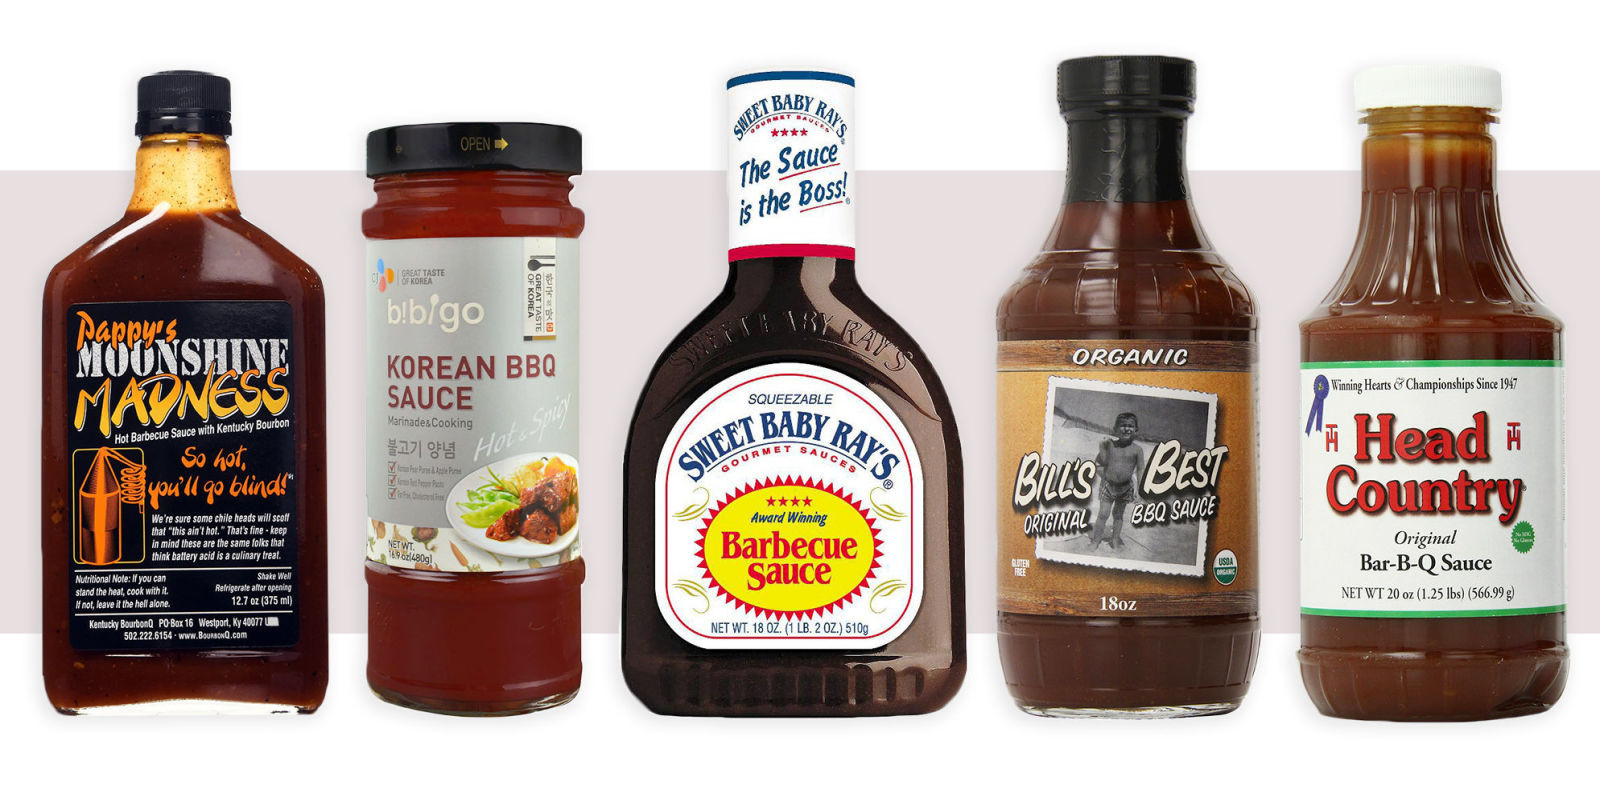 Healthy Bbq Sauce Brands  Top 28 Top Barbecue Sauce Brands 15 best barbecue